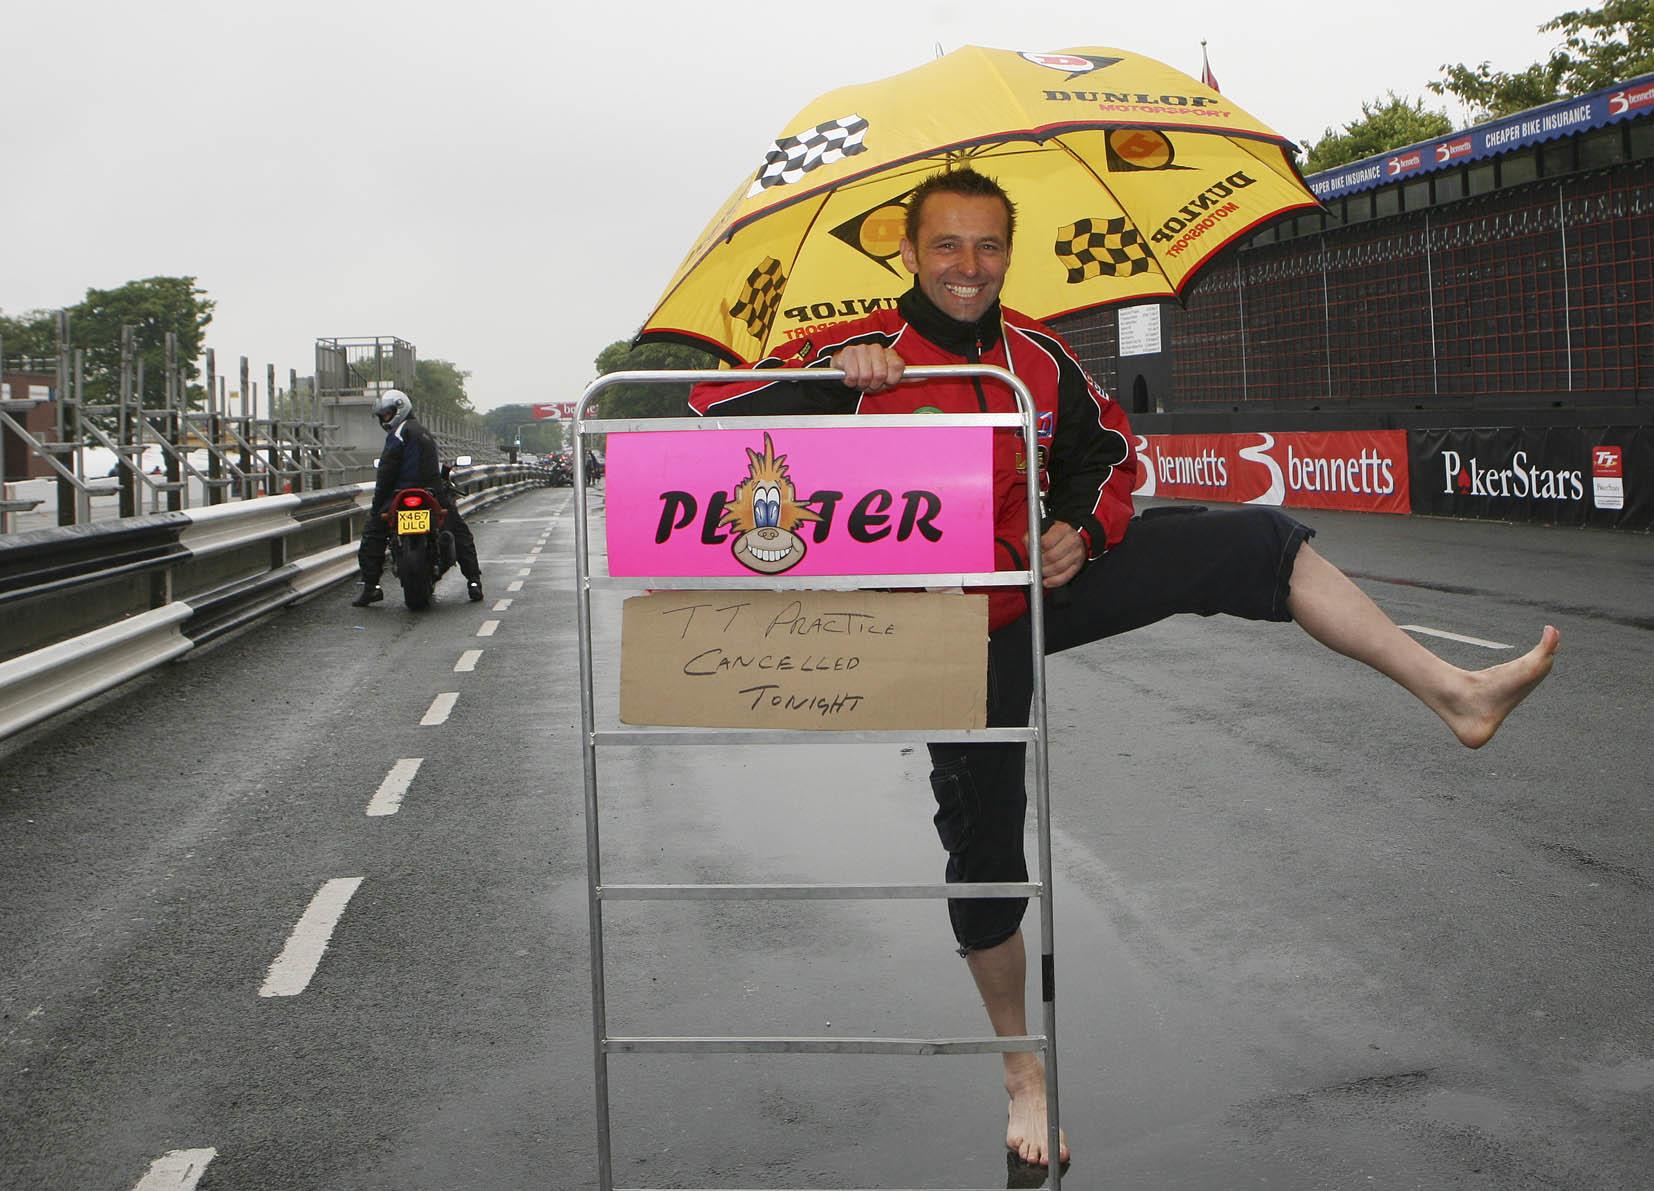 TT - Rain stops play!